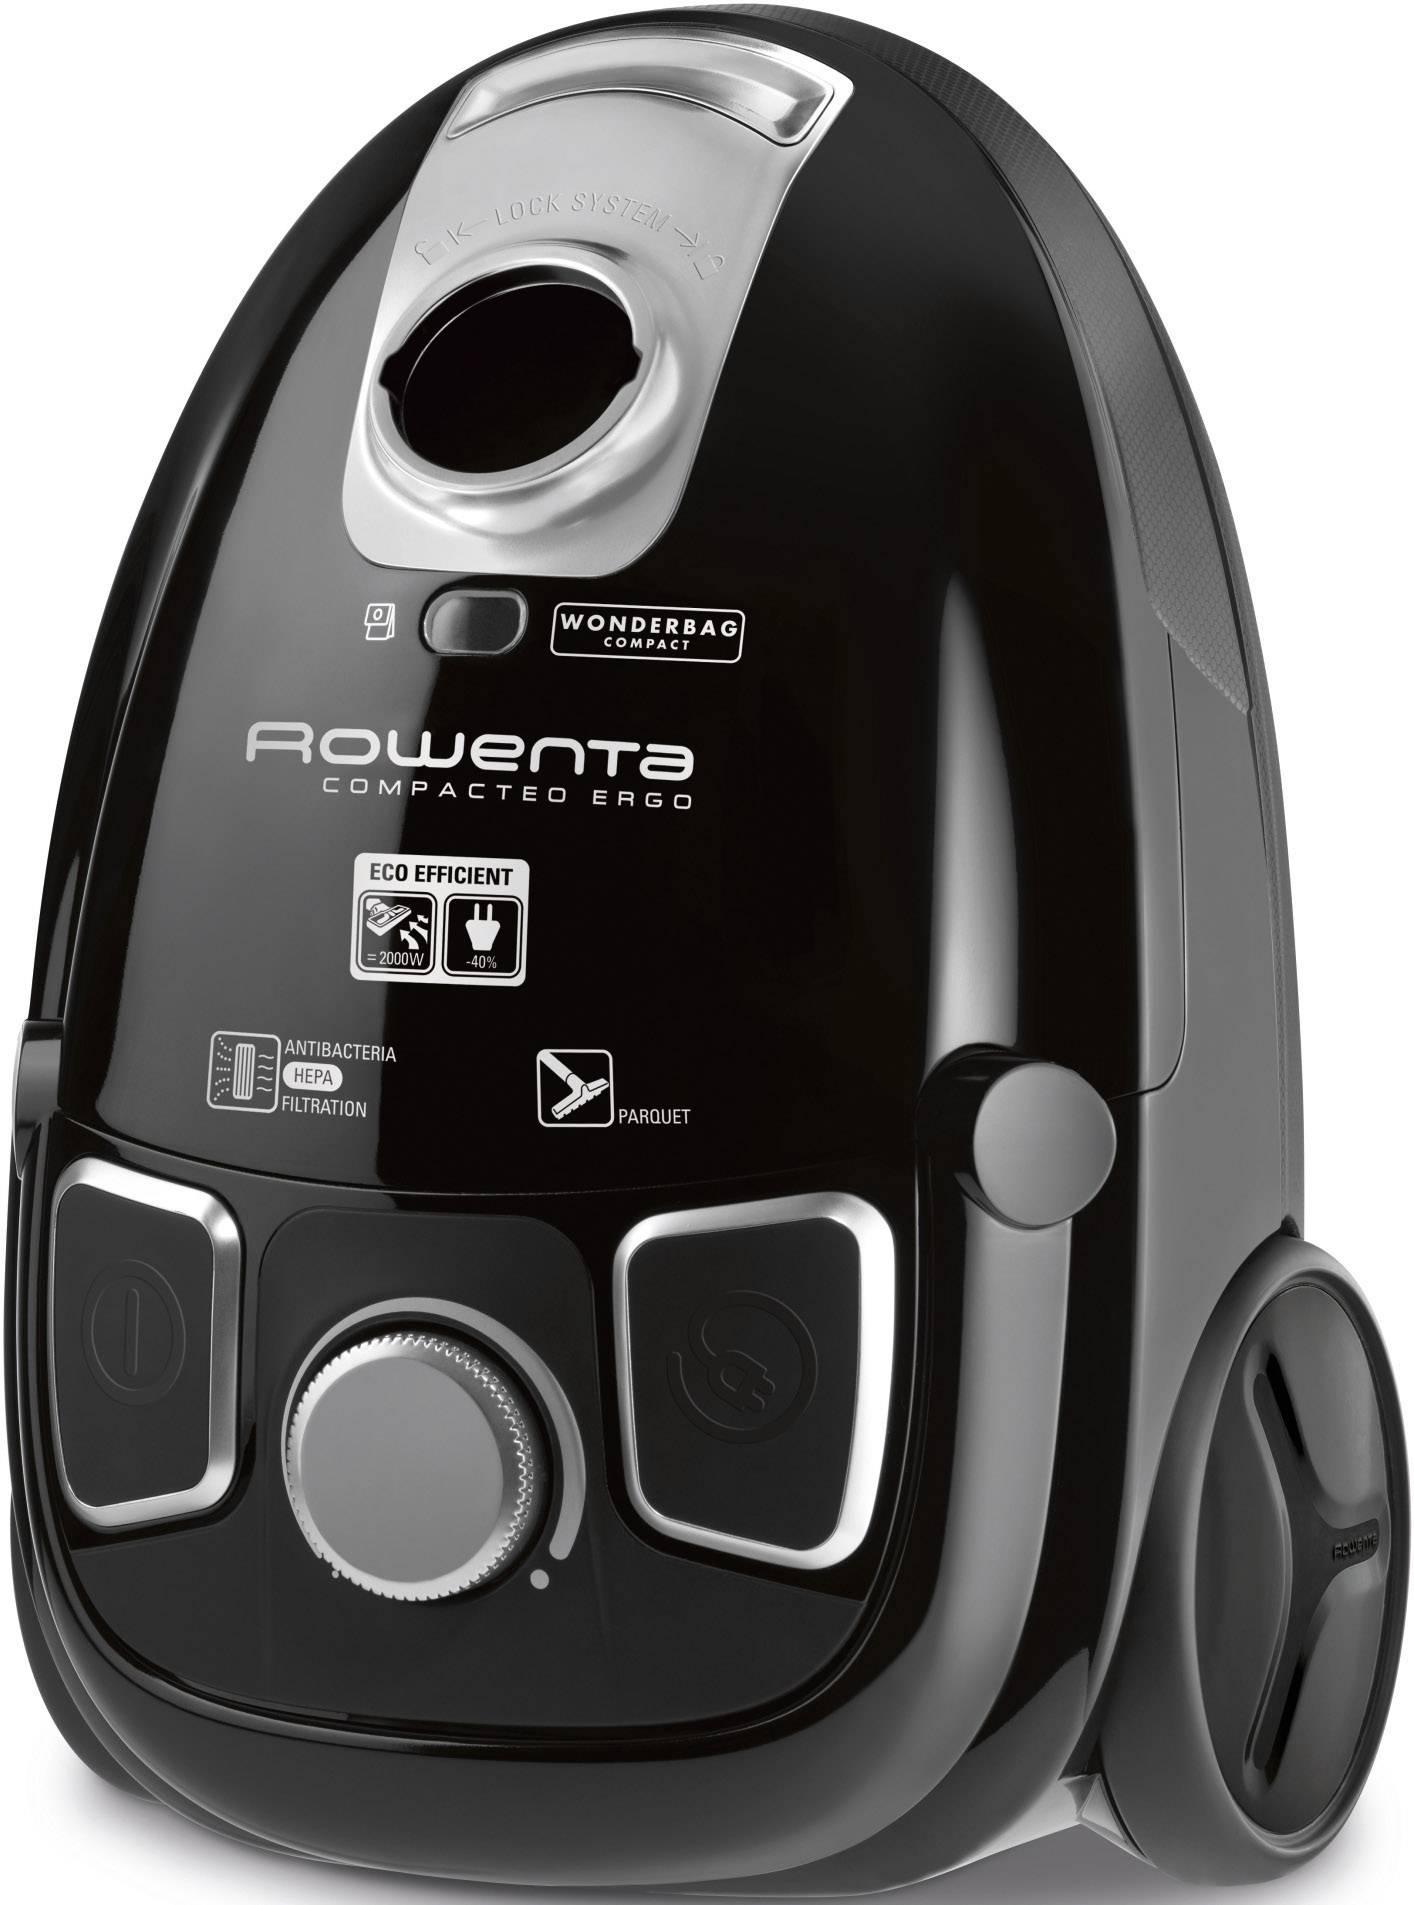 Bodendüse Einrastdüse geeignet Rowenta RO 5265 EA  Compacteo Ergo